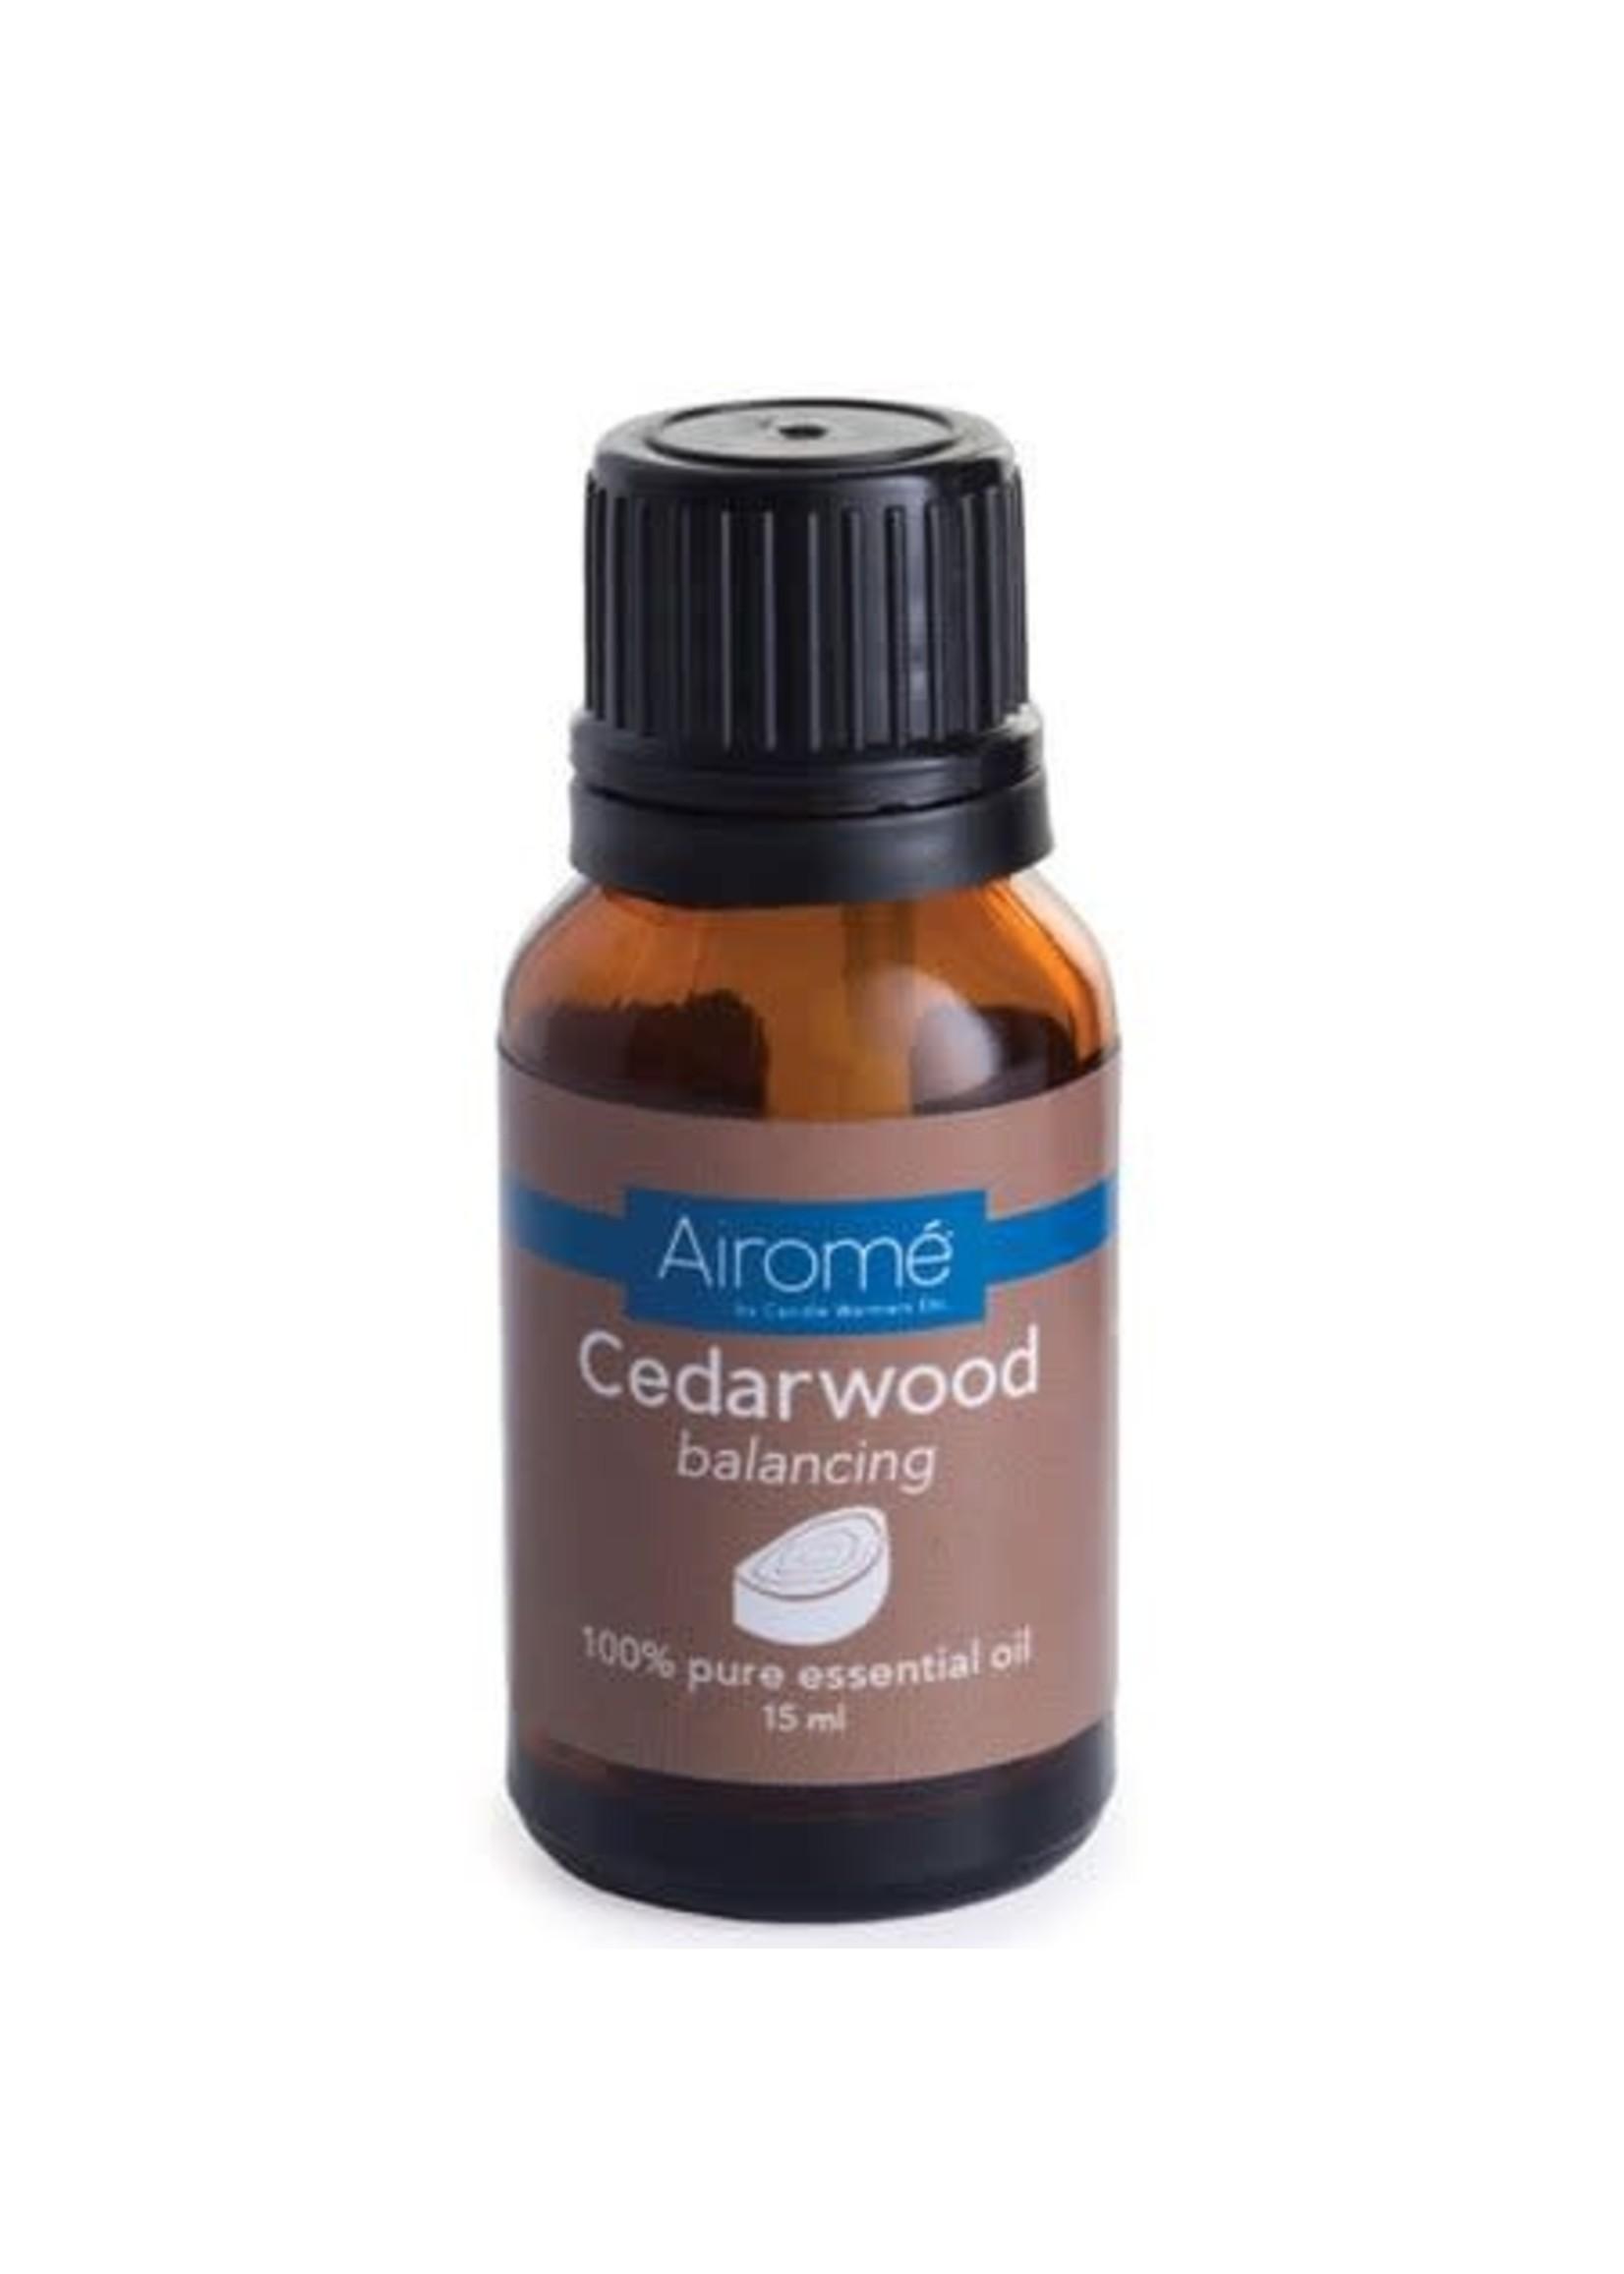 Airome Cedarwood  Essential Oil Blend 15ml